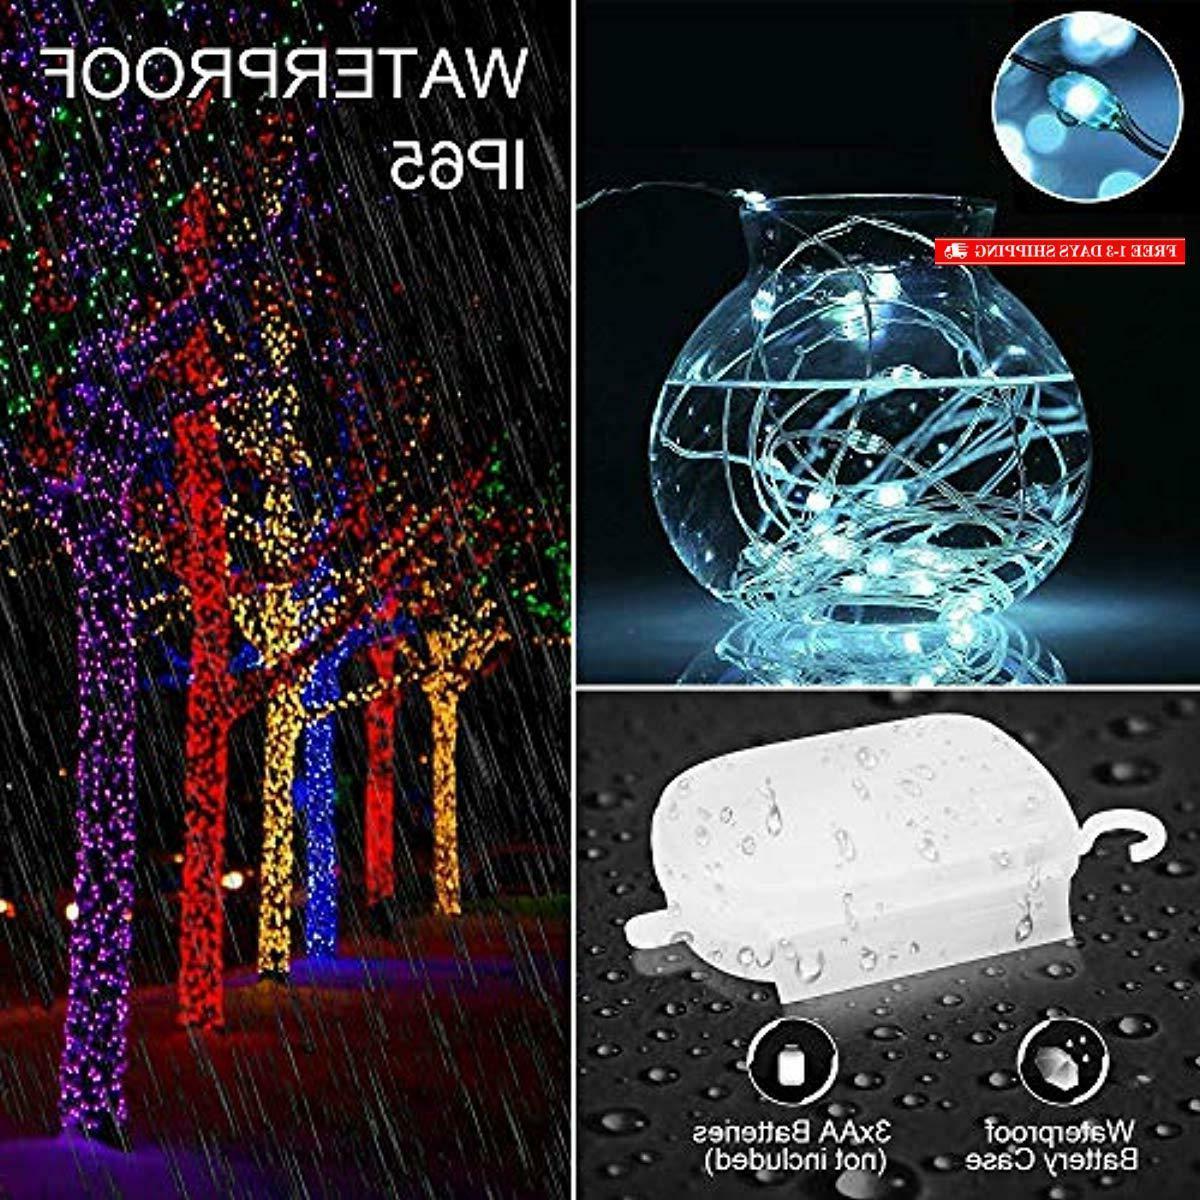 Ustellar RGB LED Starry String Outdoor Waterproof Color